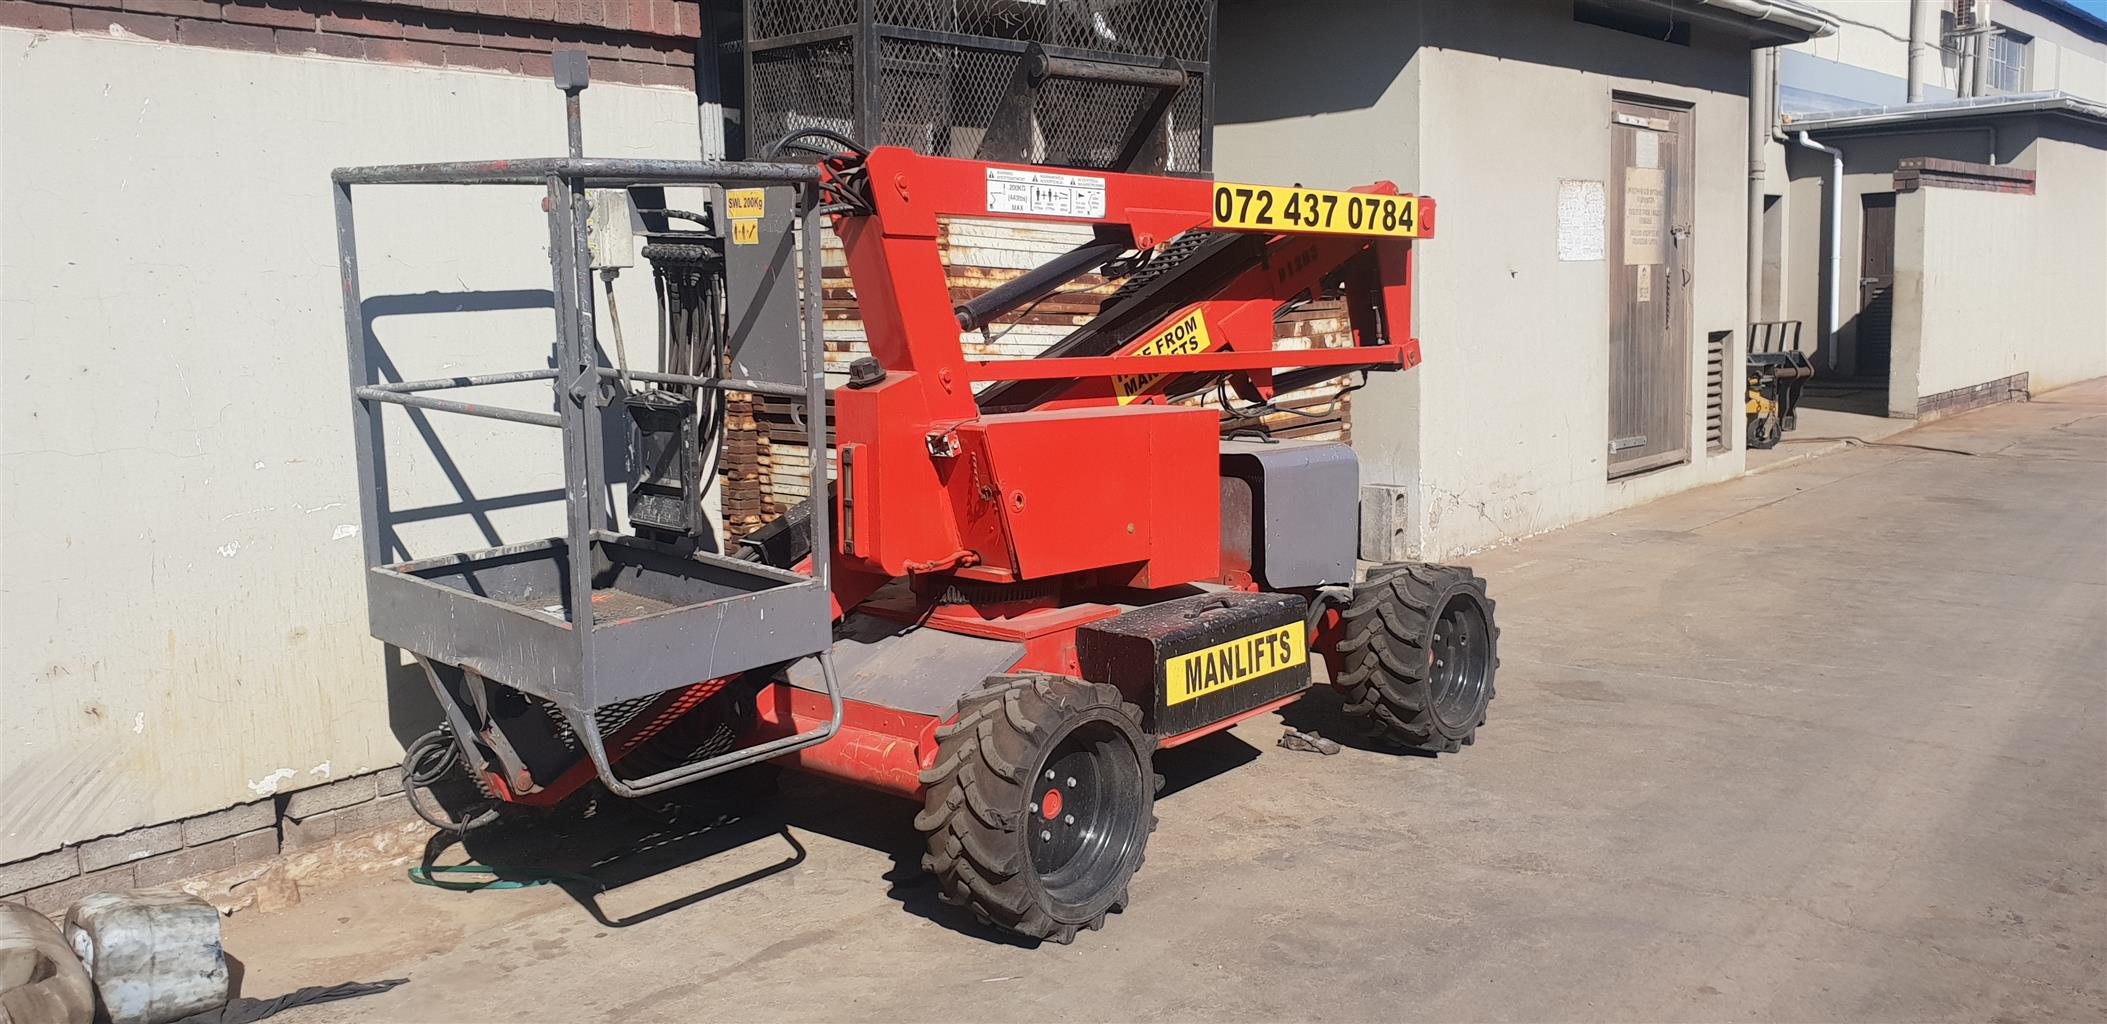 Cherry picker 12.2m self drive nifty boom